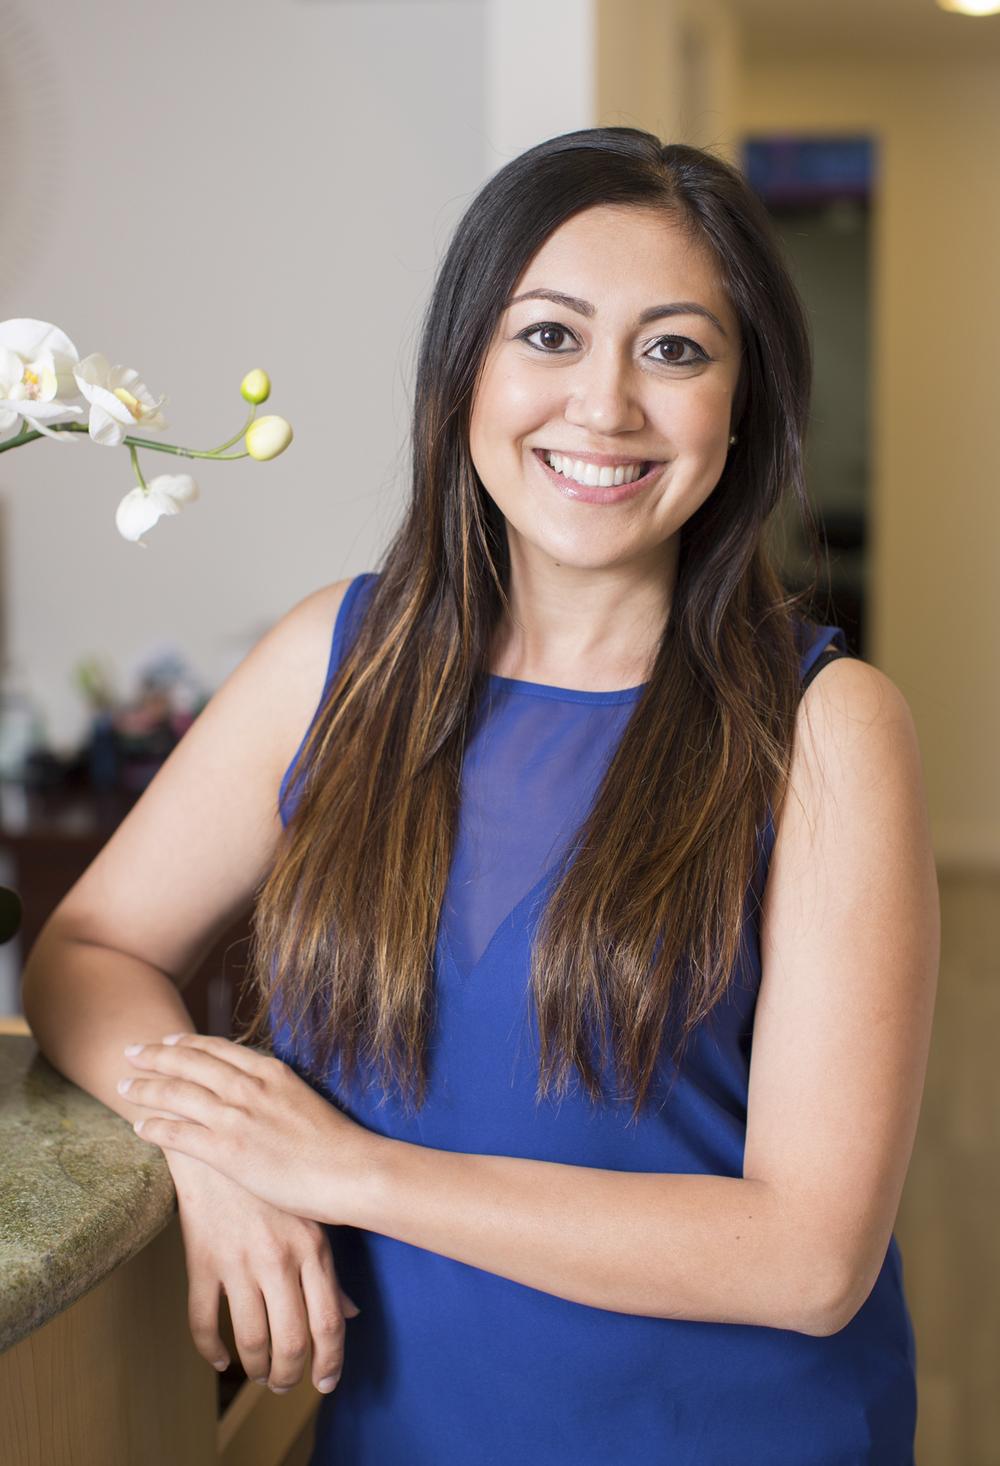 Nikki Khalili, Registered Dental Hygienist at Nice Teeth Dental in San Leandro, California.